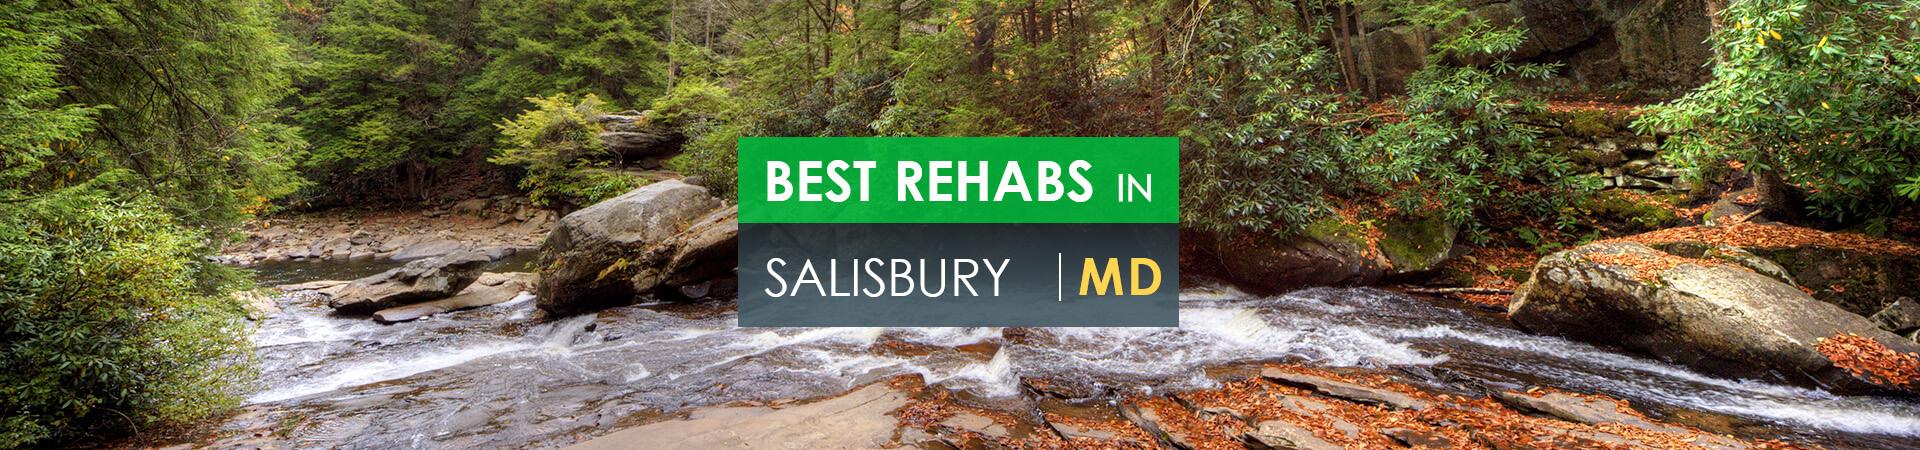 Best rehabs in Salisbury, MD